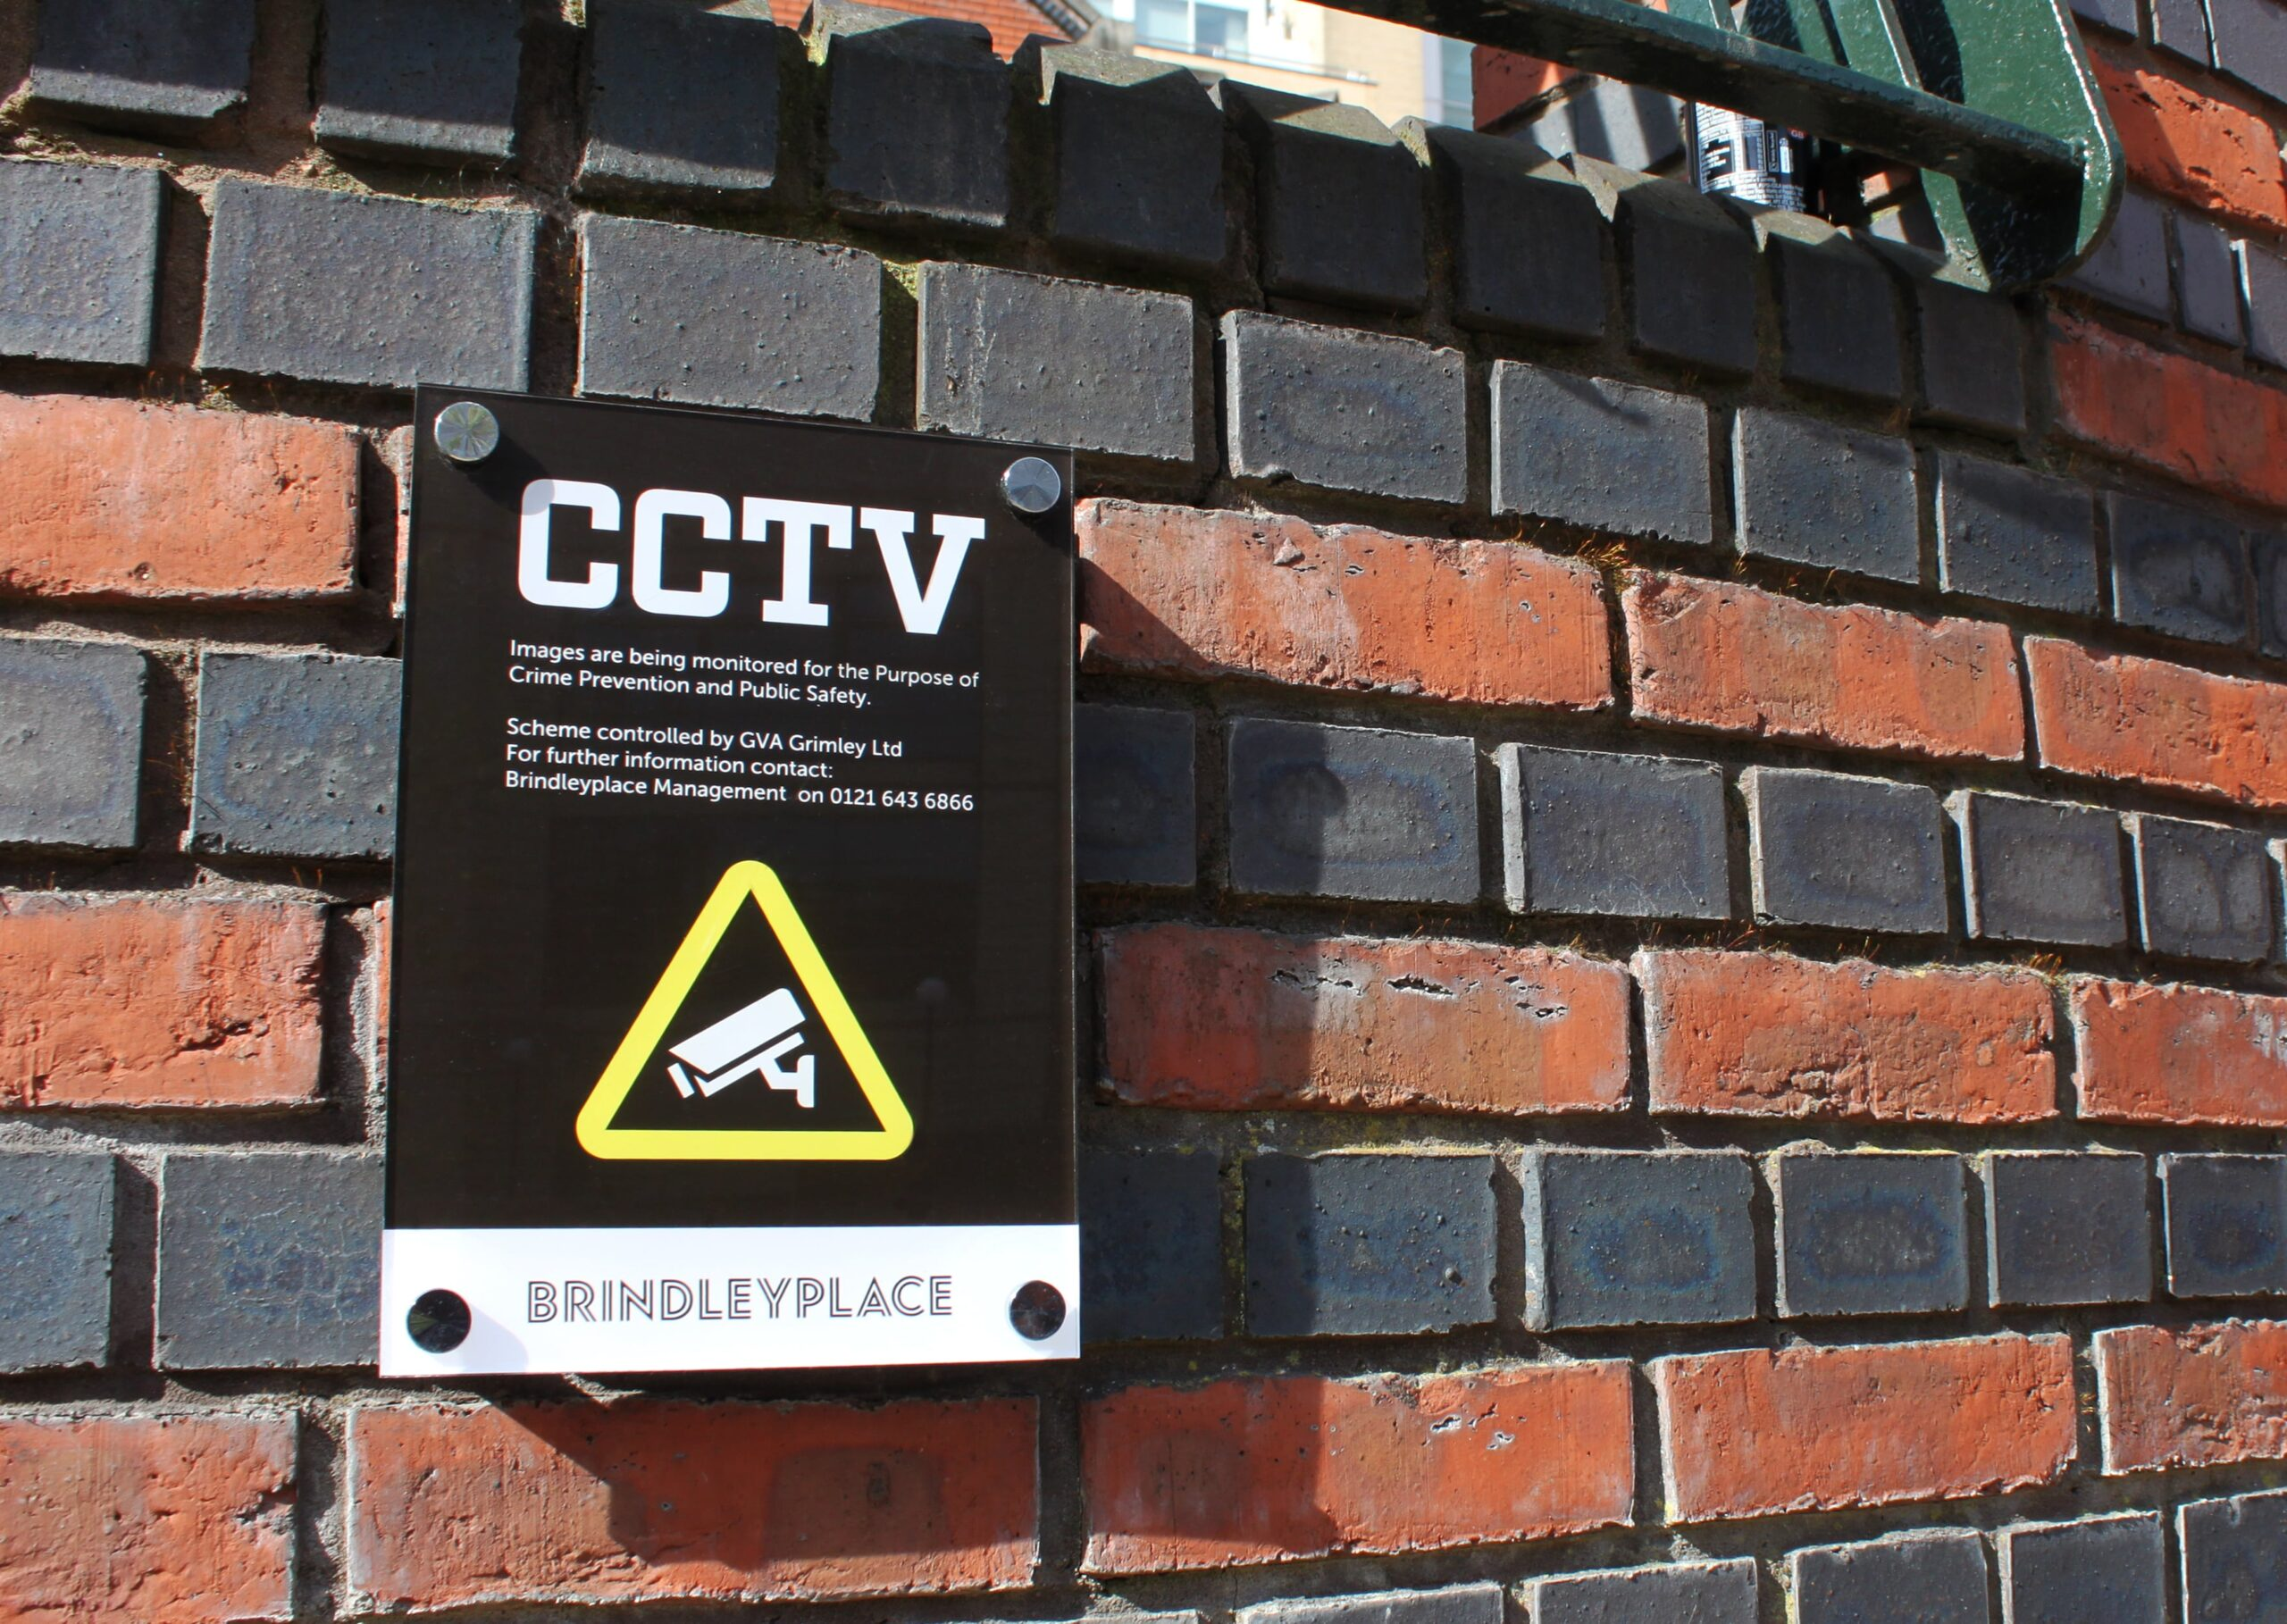 Brindley-Place-Concept-Signs-CCTV